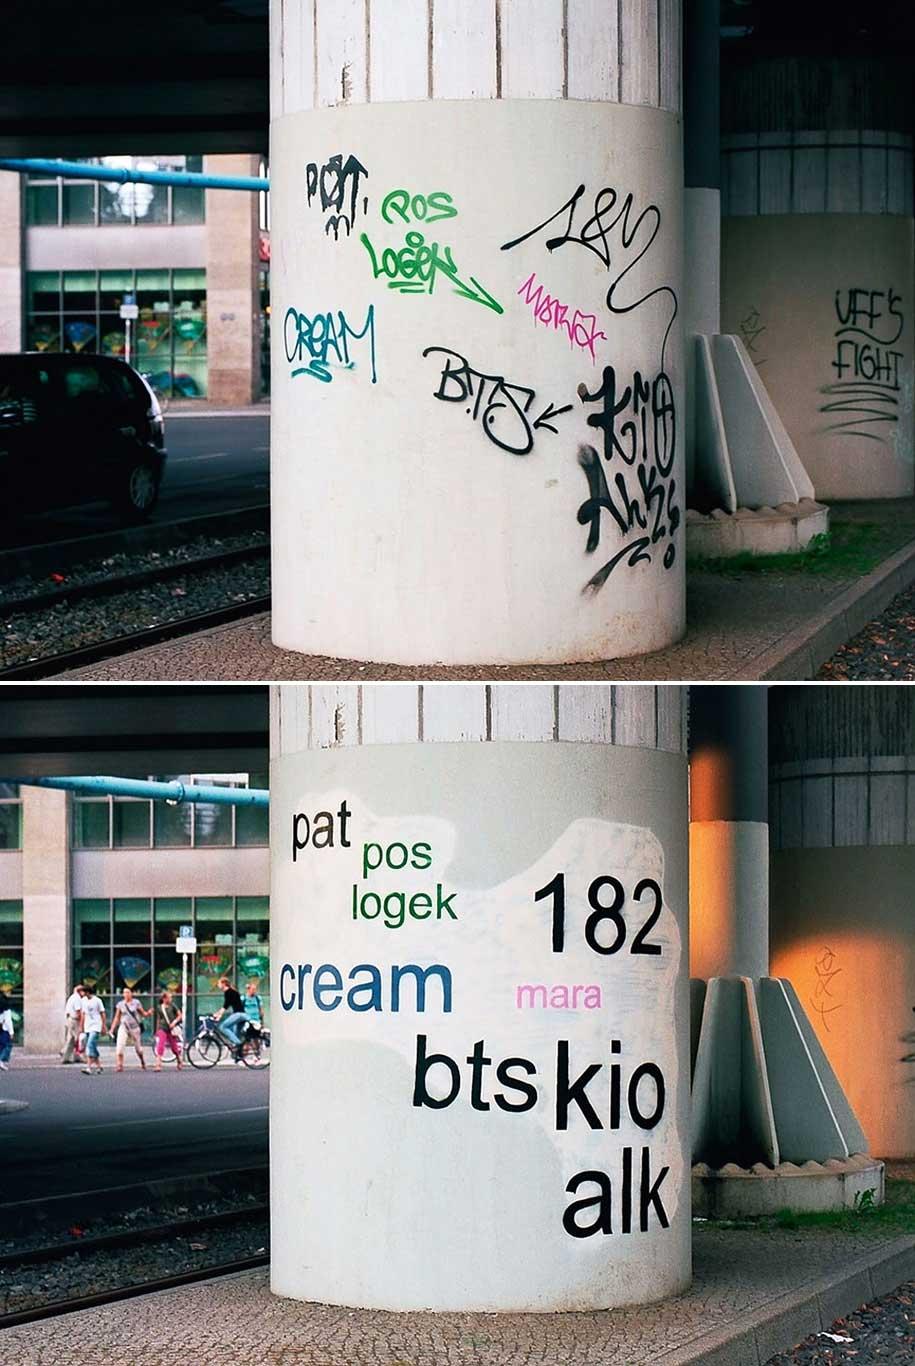 Mathieu Tremblin macht Graffiti-Tags leserlich Mathieu-Tremblin-tag-clouds-graffiti_04